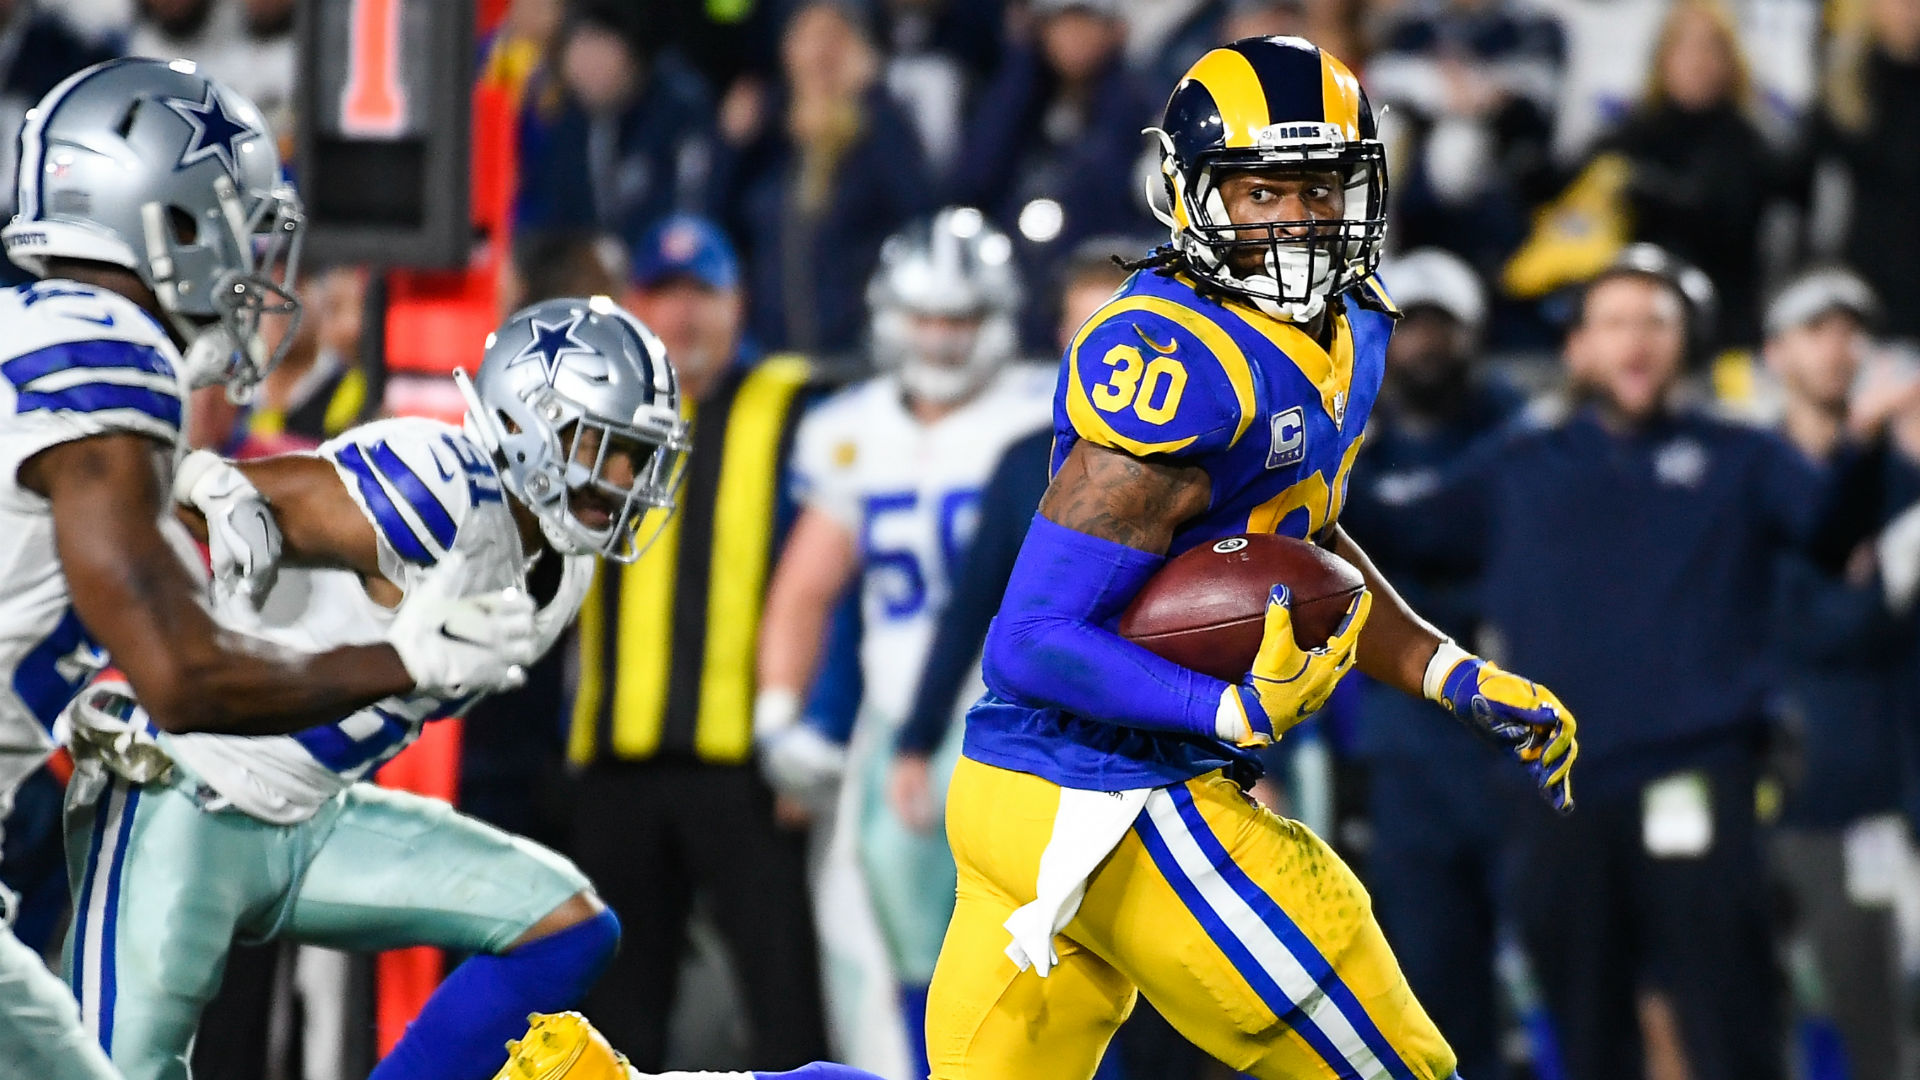 NFL picks, predictions against spread for Week 15: Rams top Cowboys; Steelers stuff Bills; Texans upset Titans